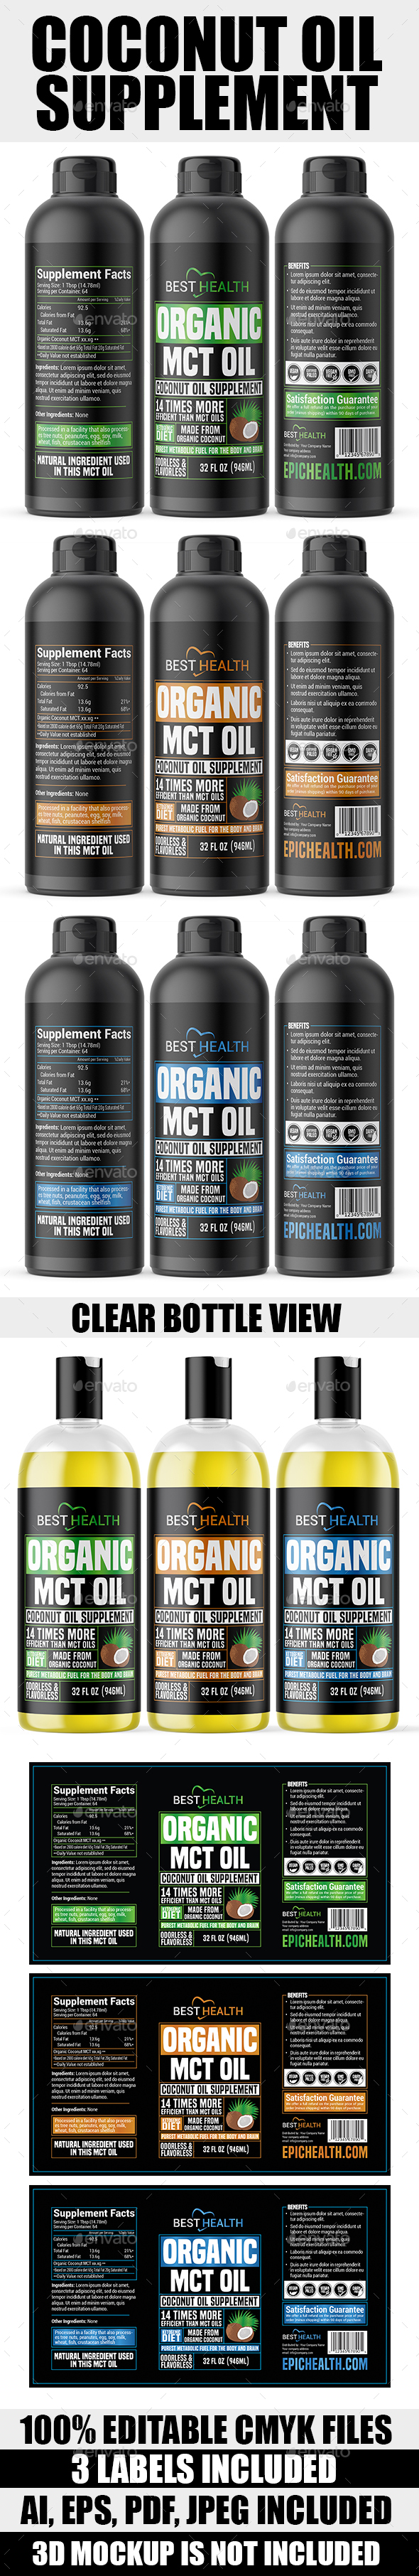 Coconut Oil Supplement (MCT Oil)